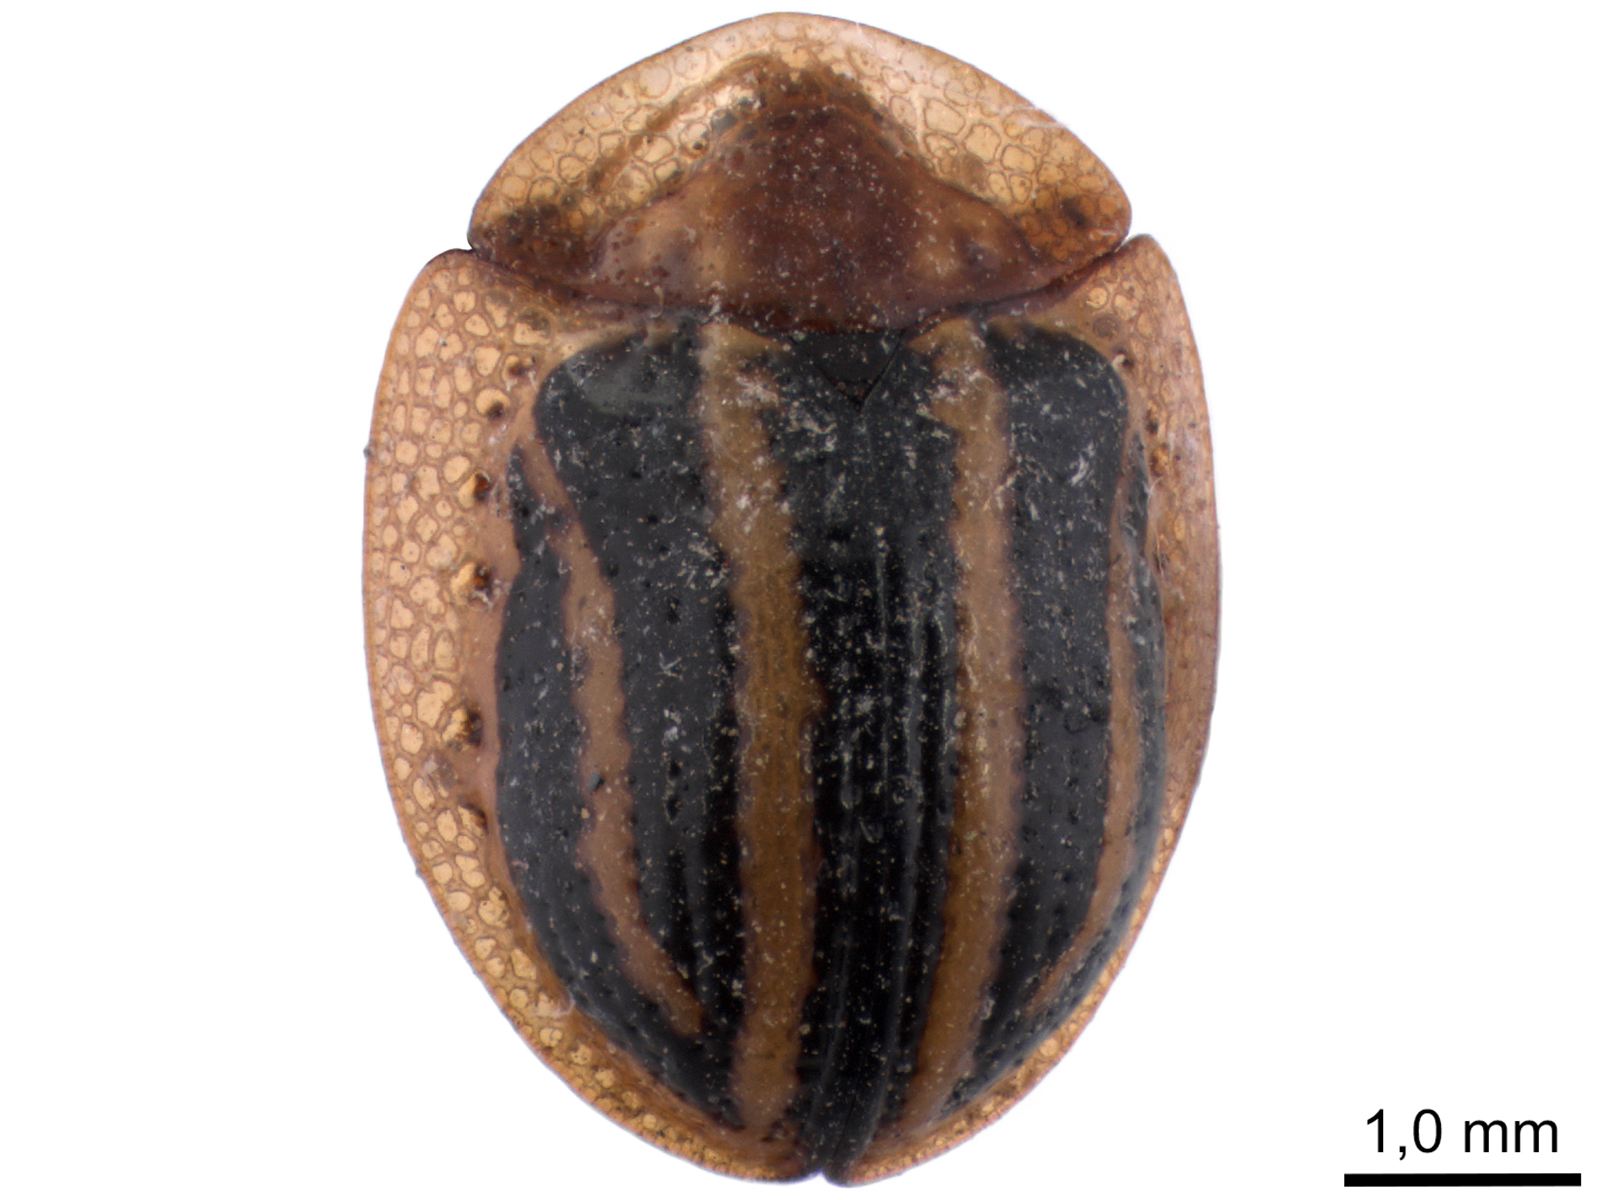 Agroiconotapropinqua(Boheman,1855)